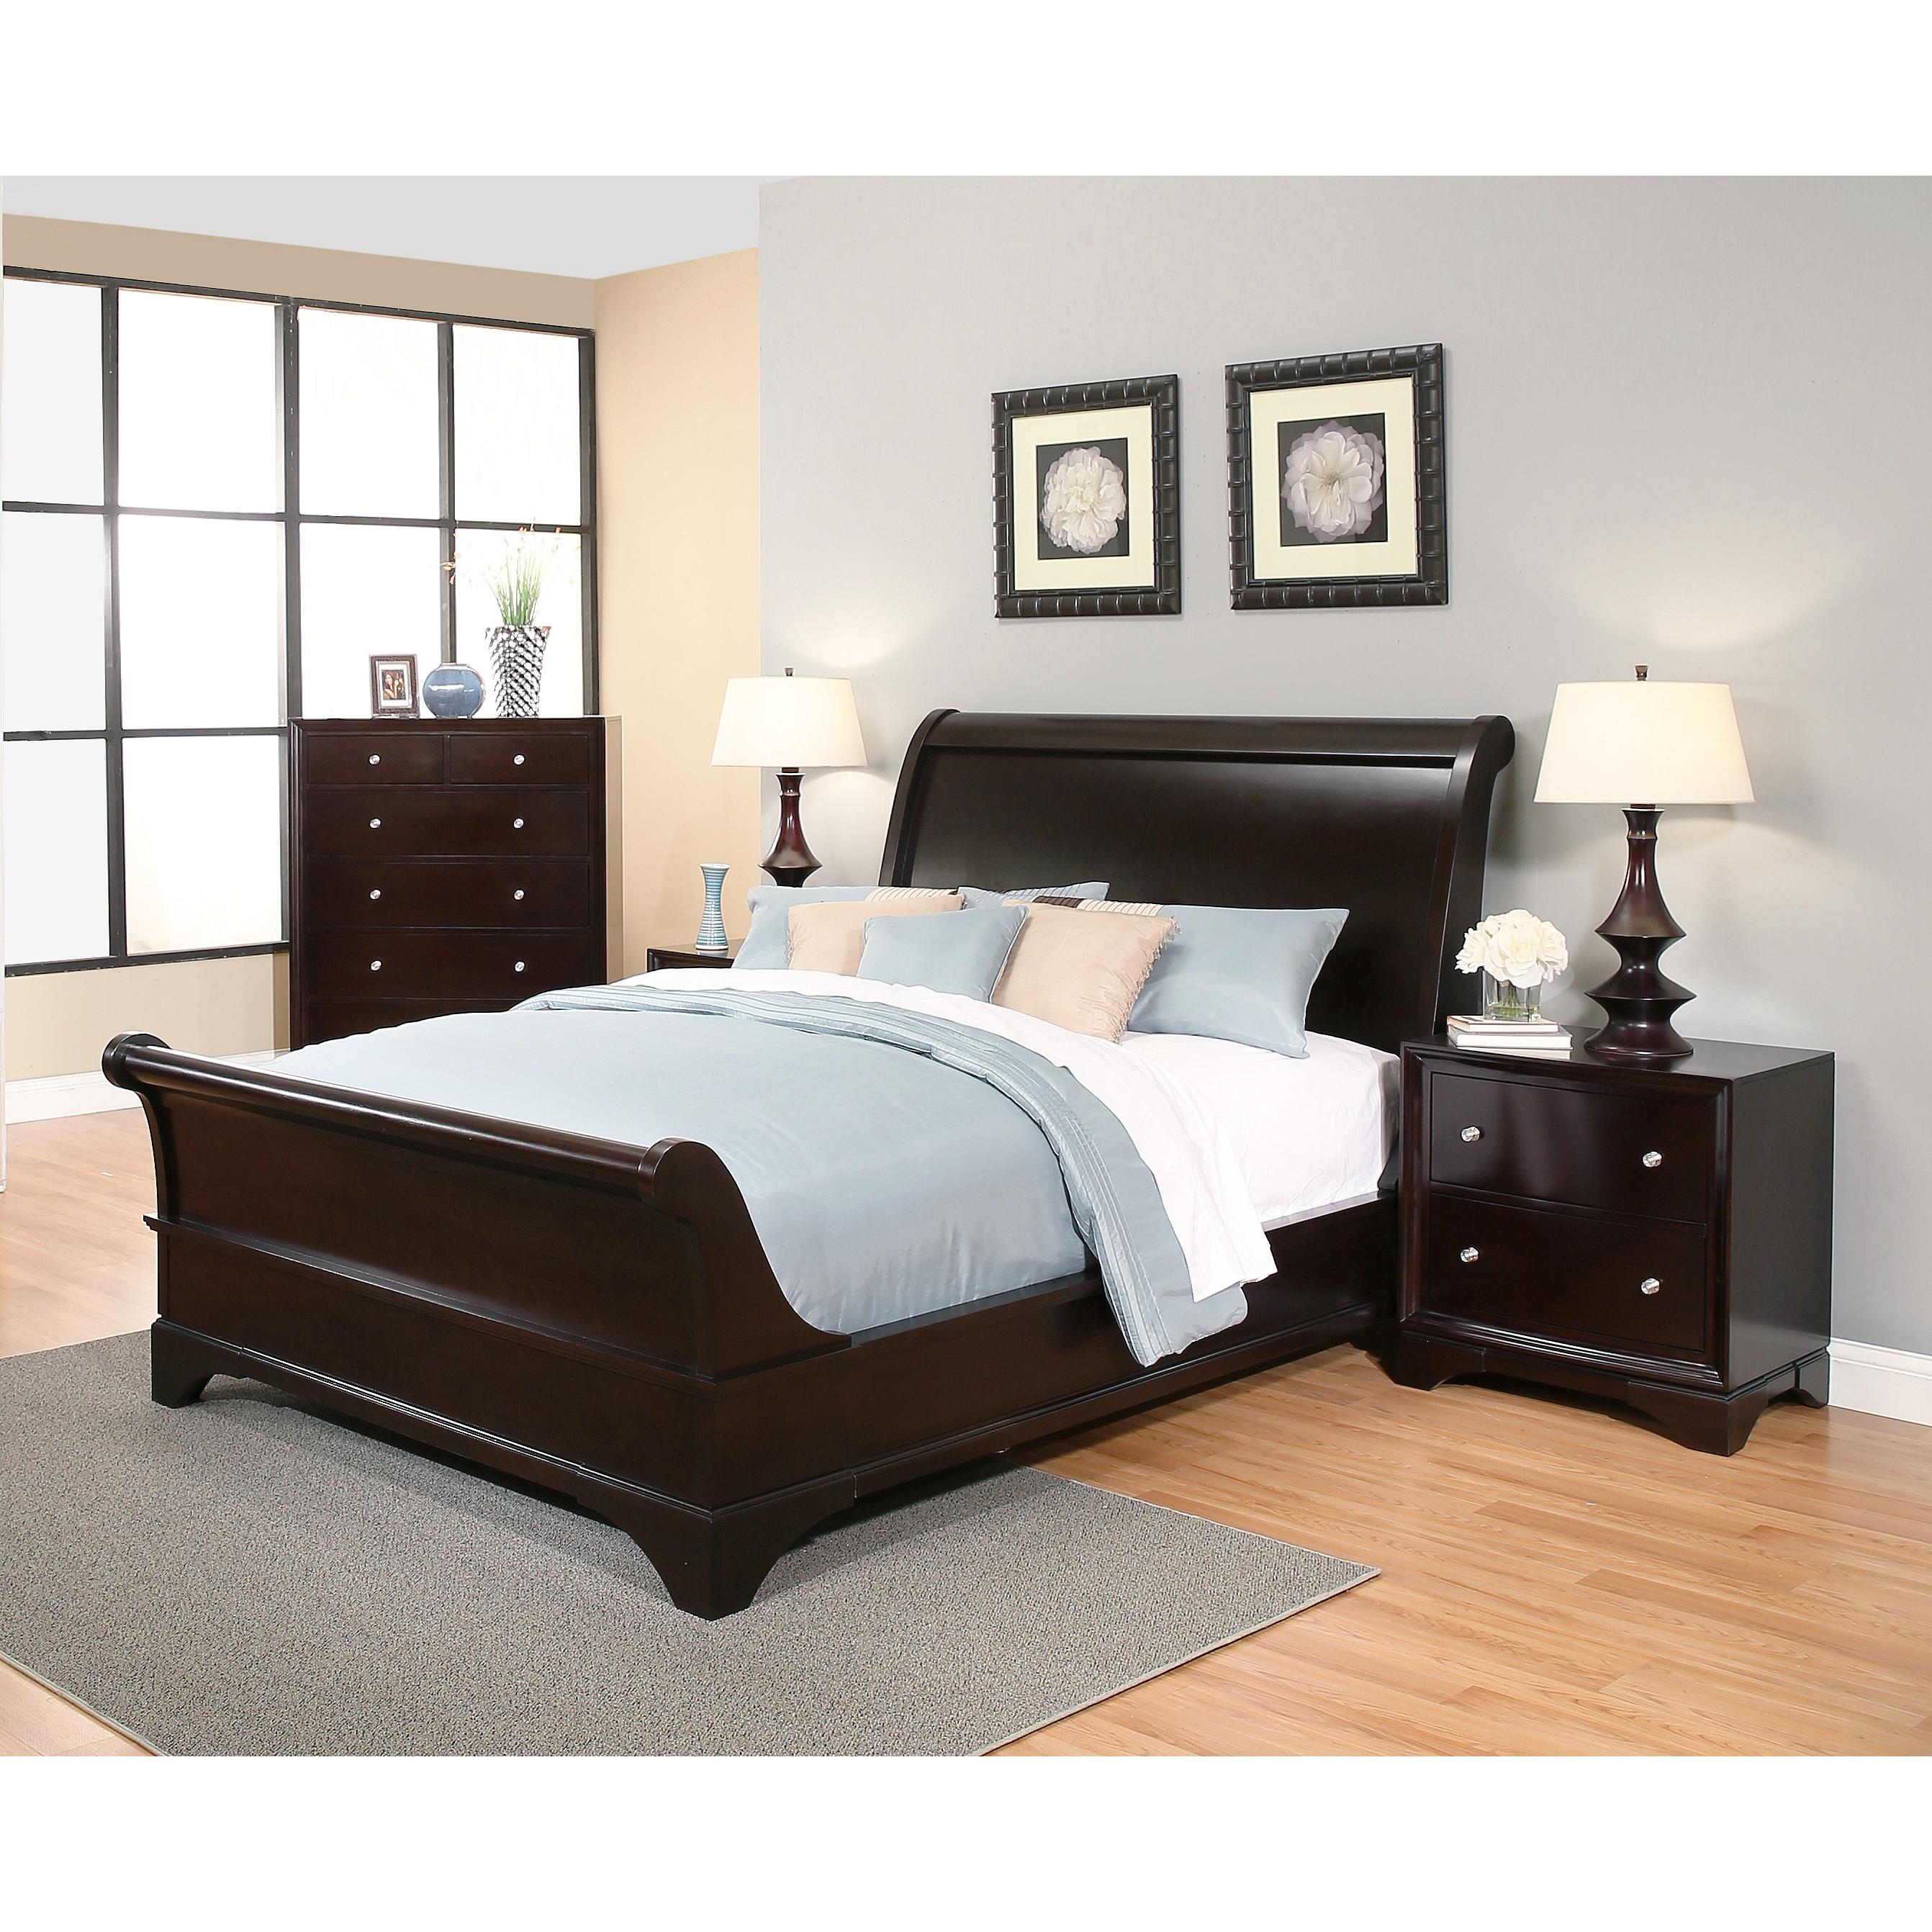 bedroom room broyhill raw set rhone manor bed sleigh